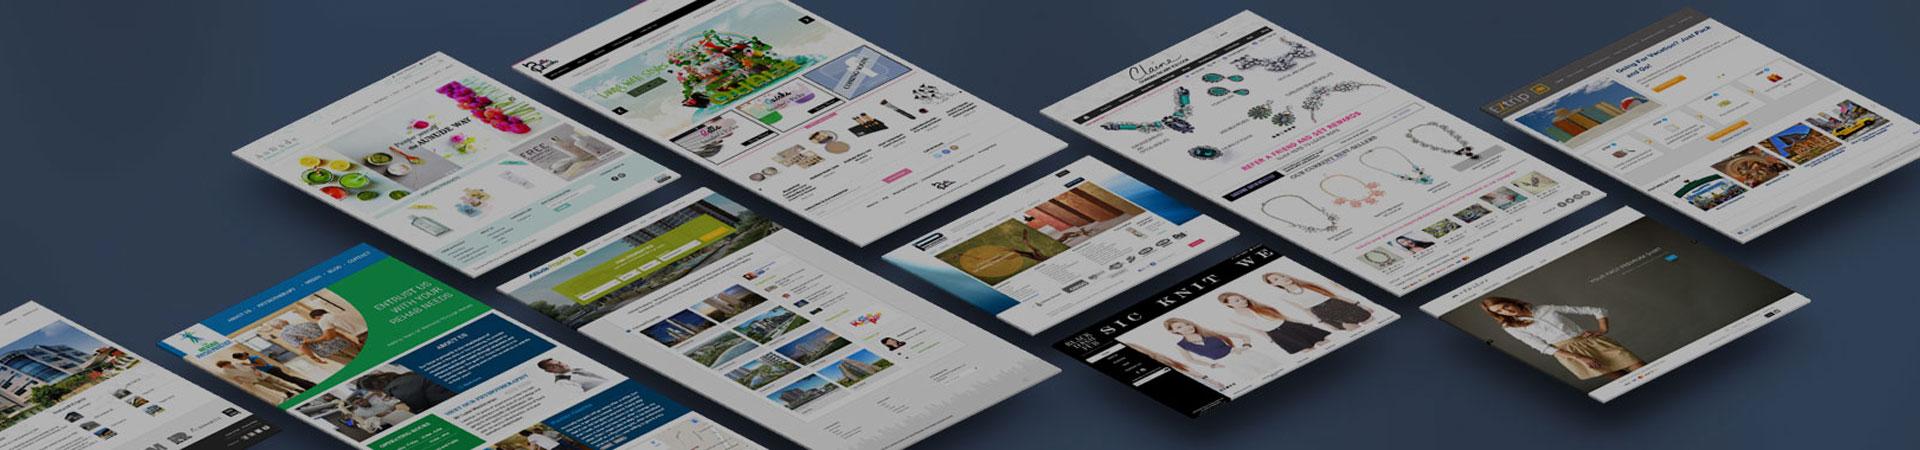 Website Design Singapore - JD Eiffel